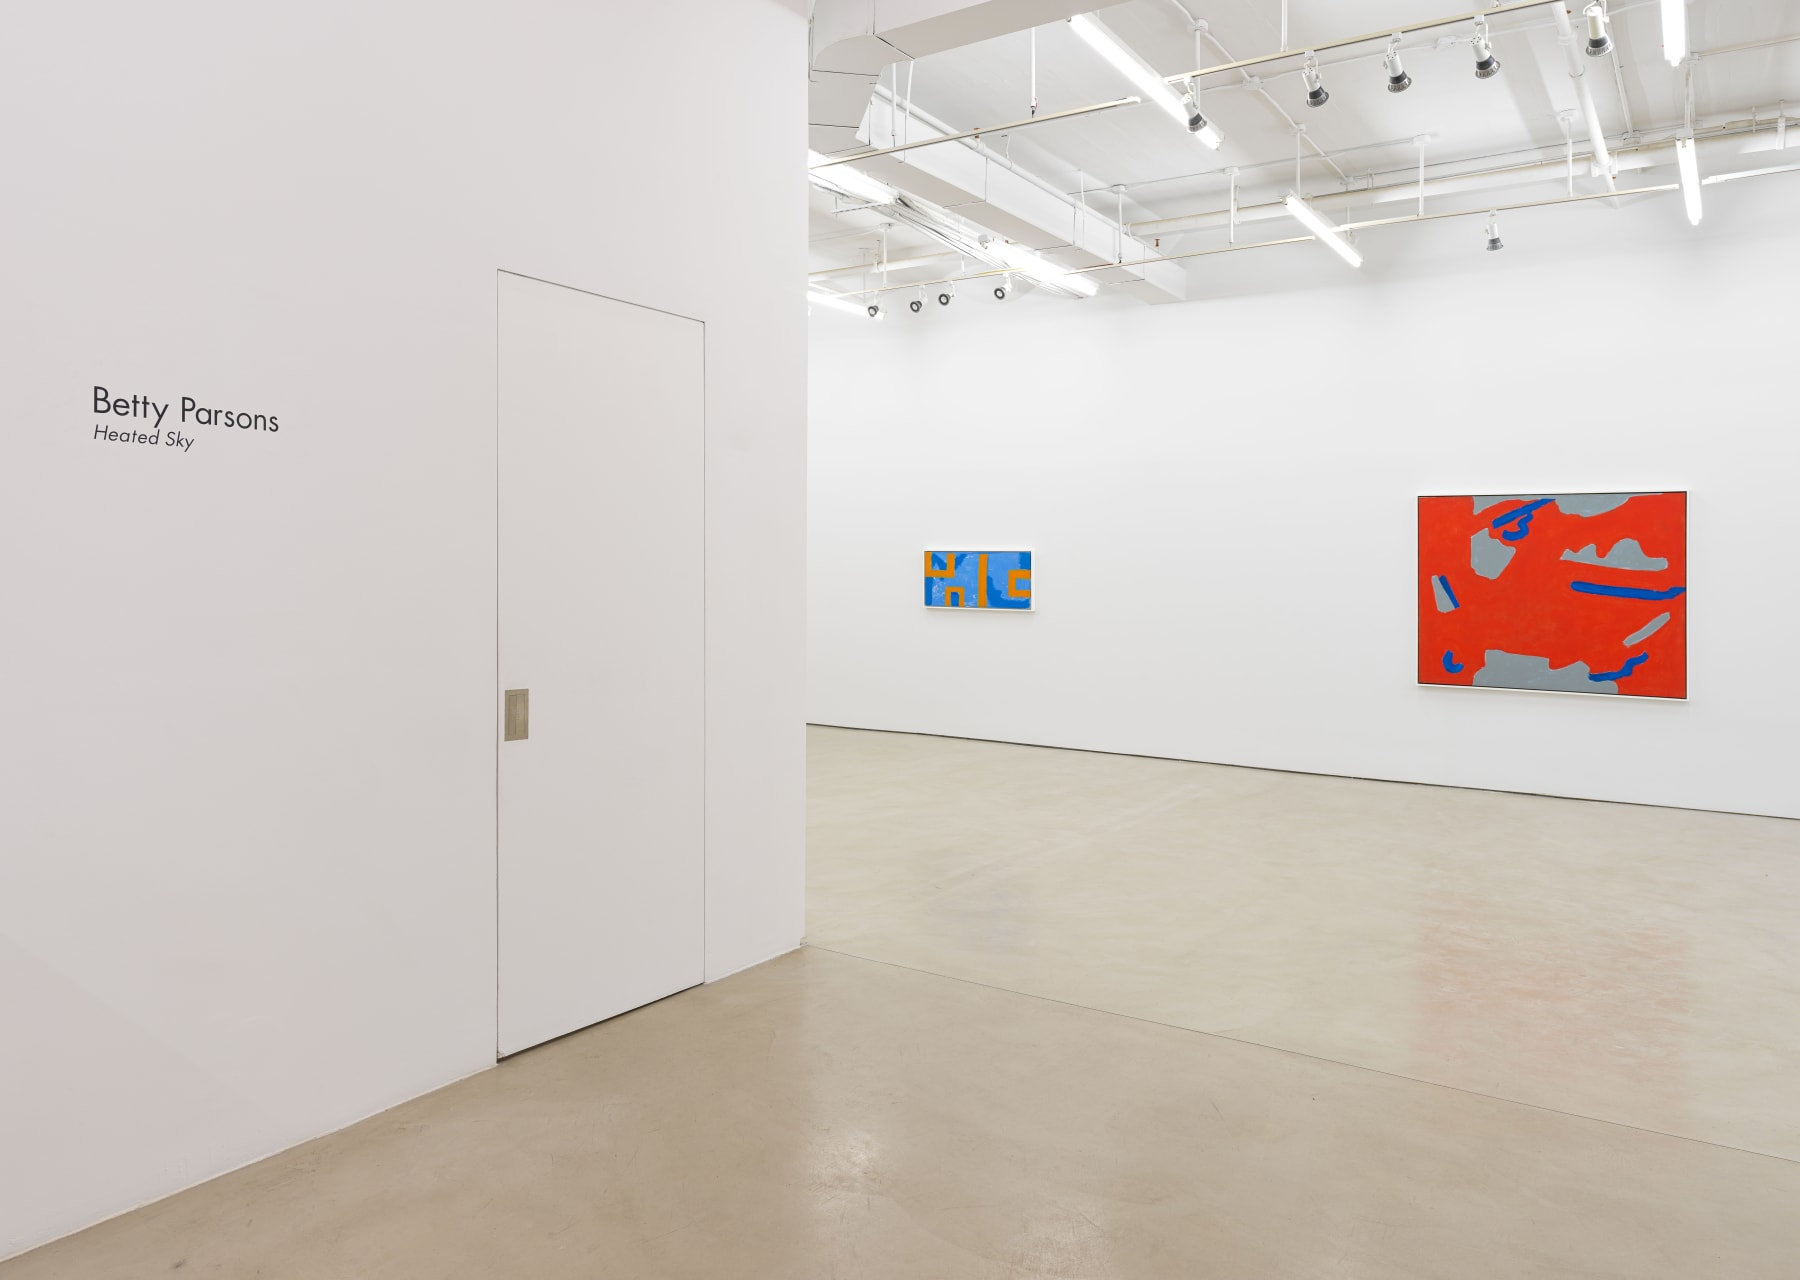 Installation view, Alexander Gray Associates (2020)